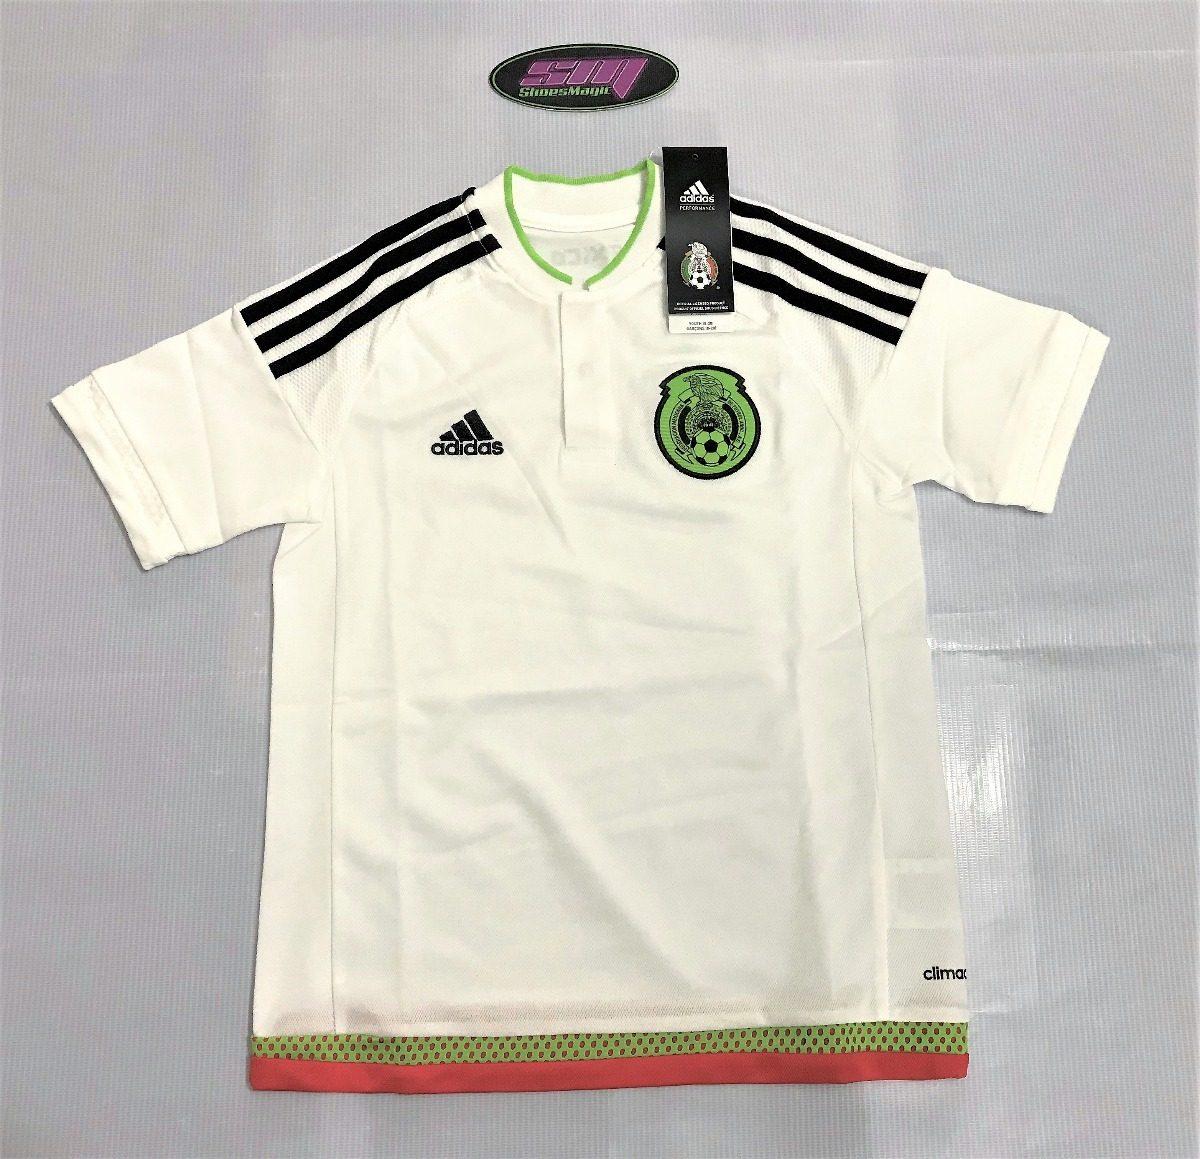 cf58efcf0f9f6 Playera adidas De Mexico Blanca Para Niño -   399.00 en Mercado Libre